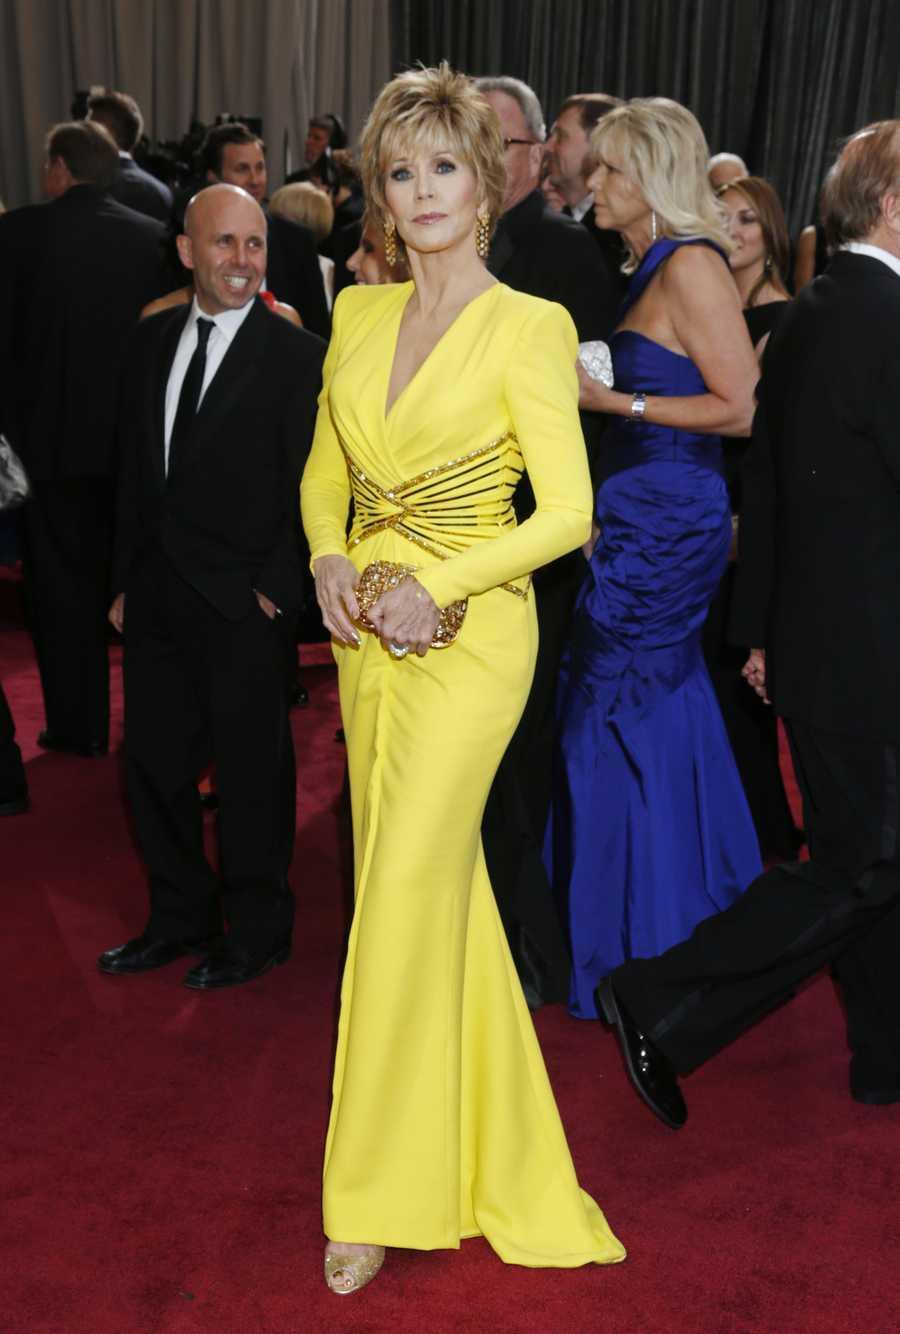 Jane Fonda arrives at the Oscars